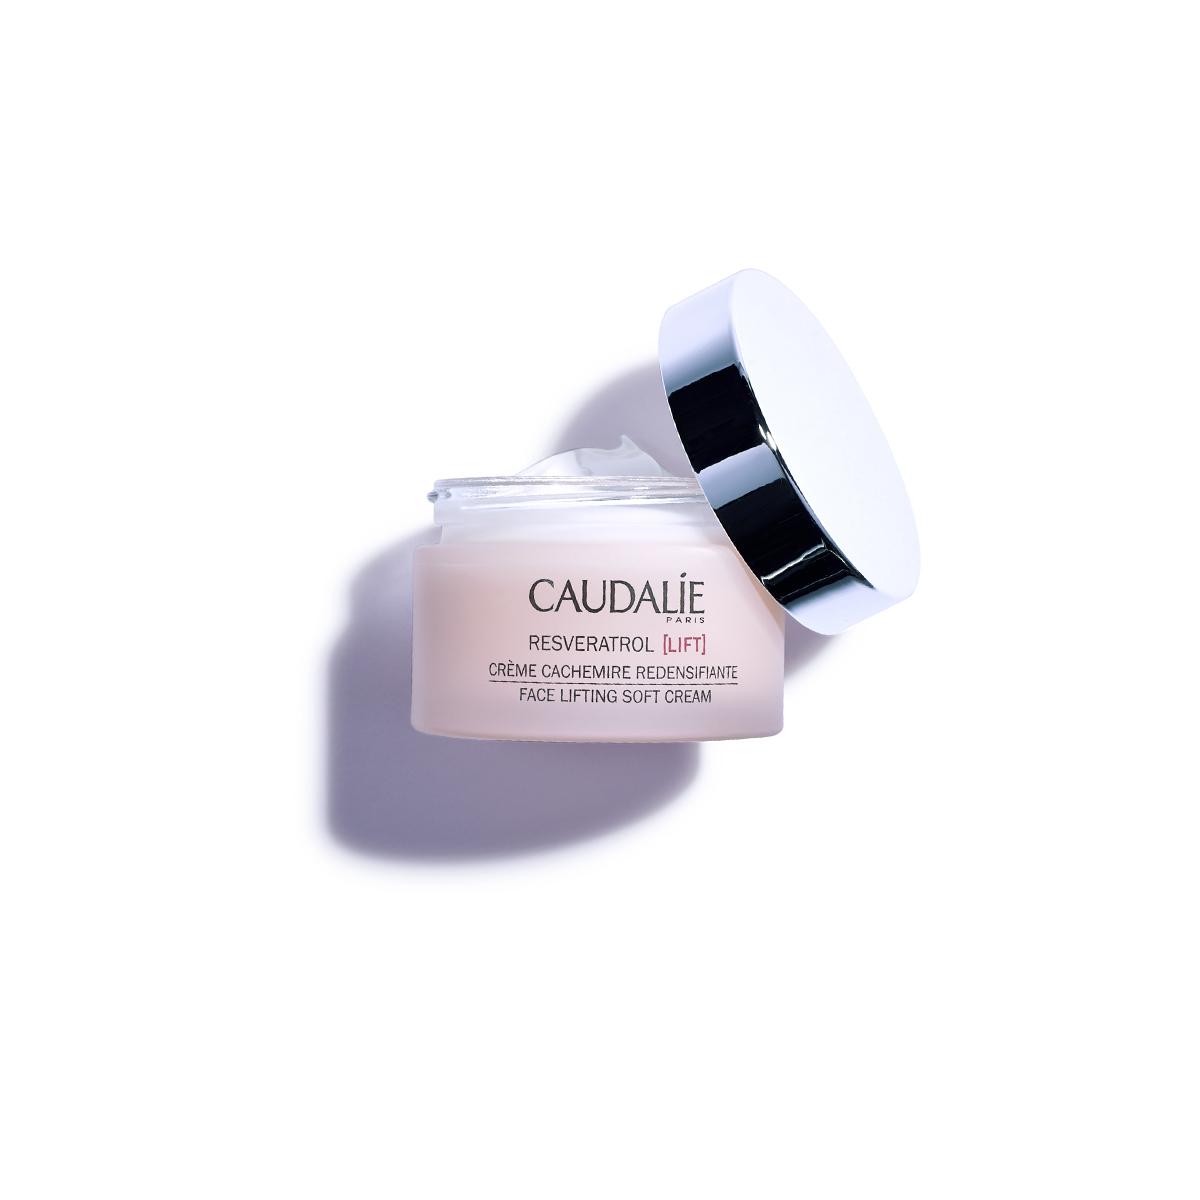 Resveratrol[Lift] Face Lifting Soft Cream 50ml